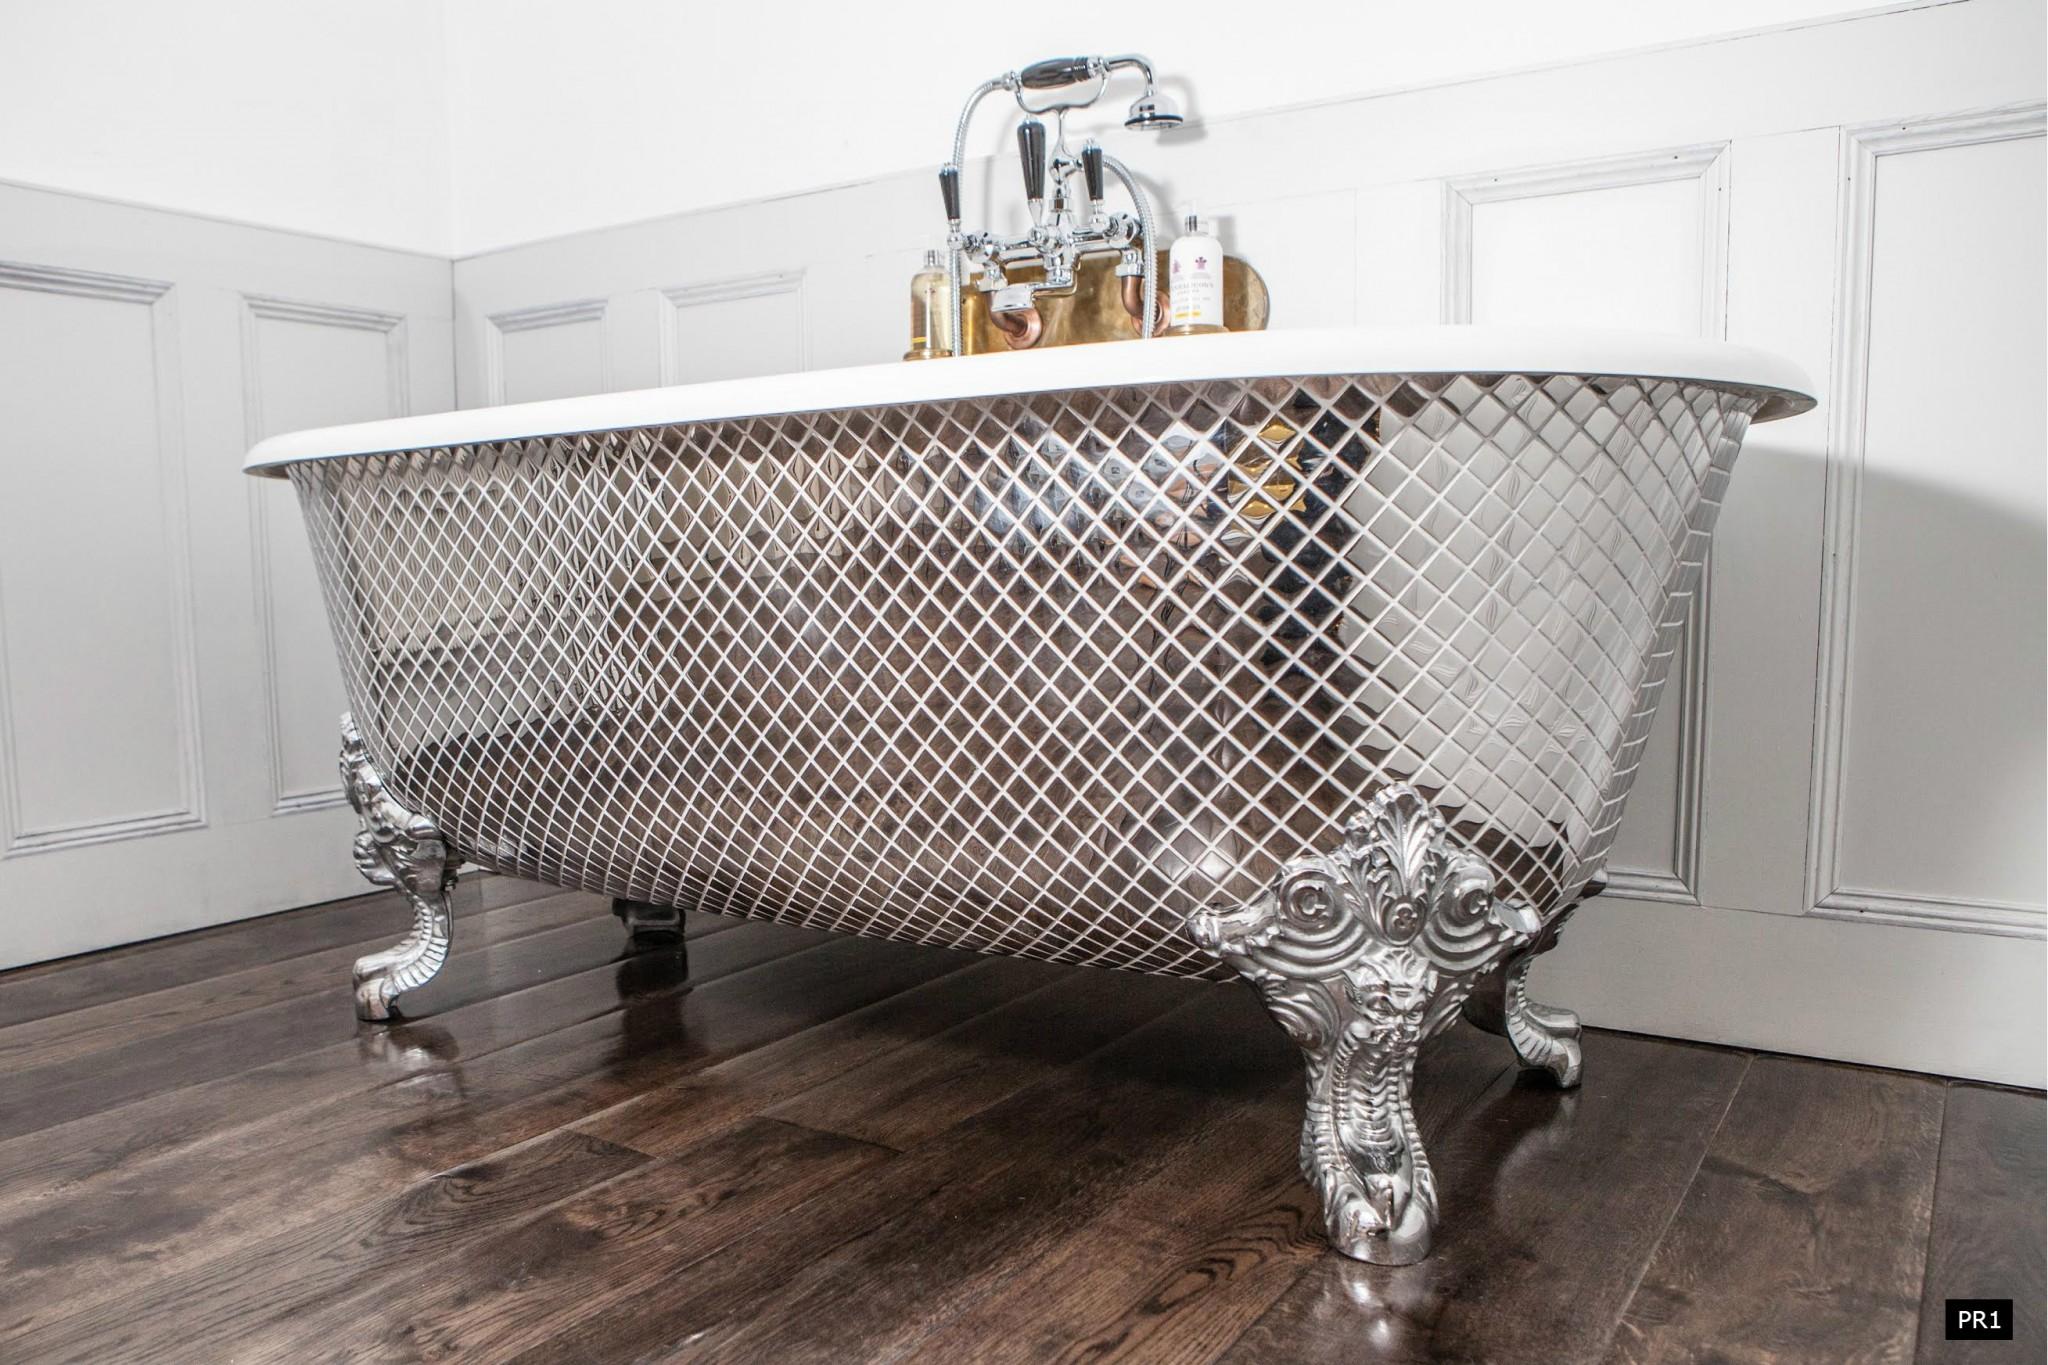 Bespoke Cistern , Polished Metal Bespoke Cisterns